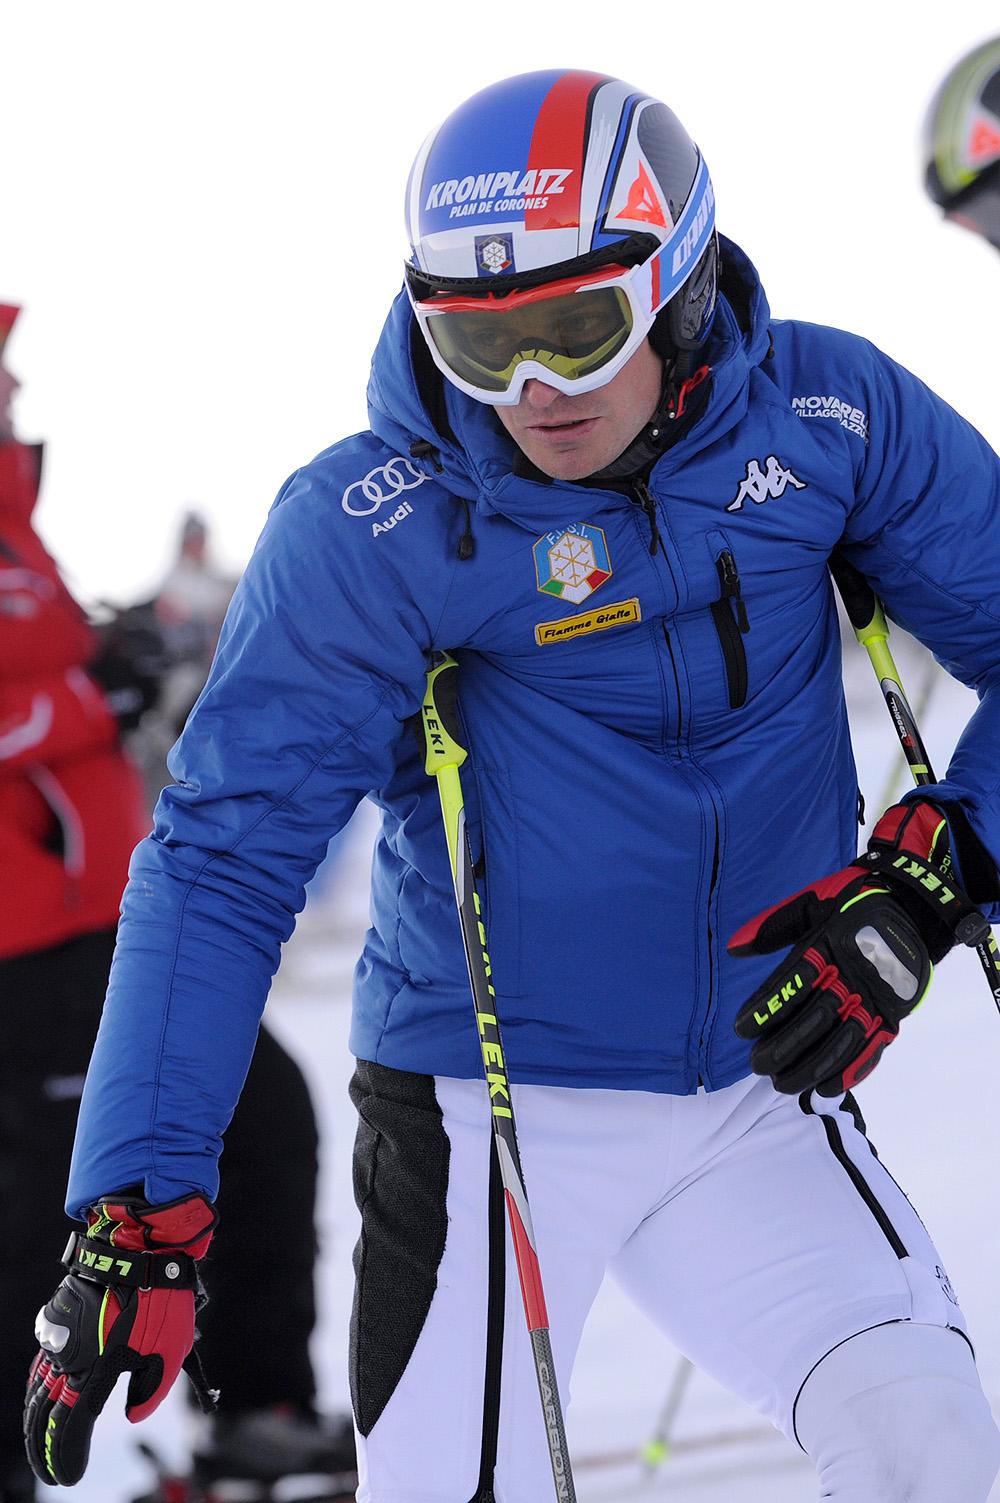 Moelgg-Manfred-Manuela-Skifahrer-41.jpg